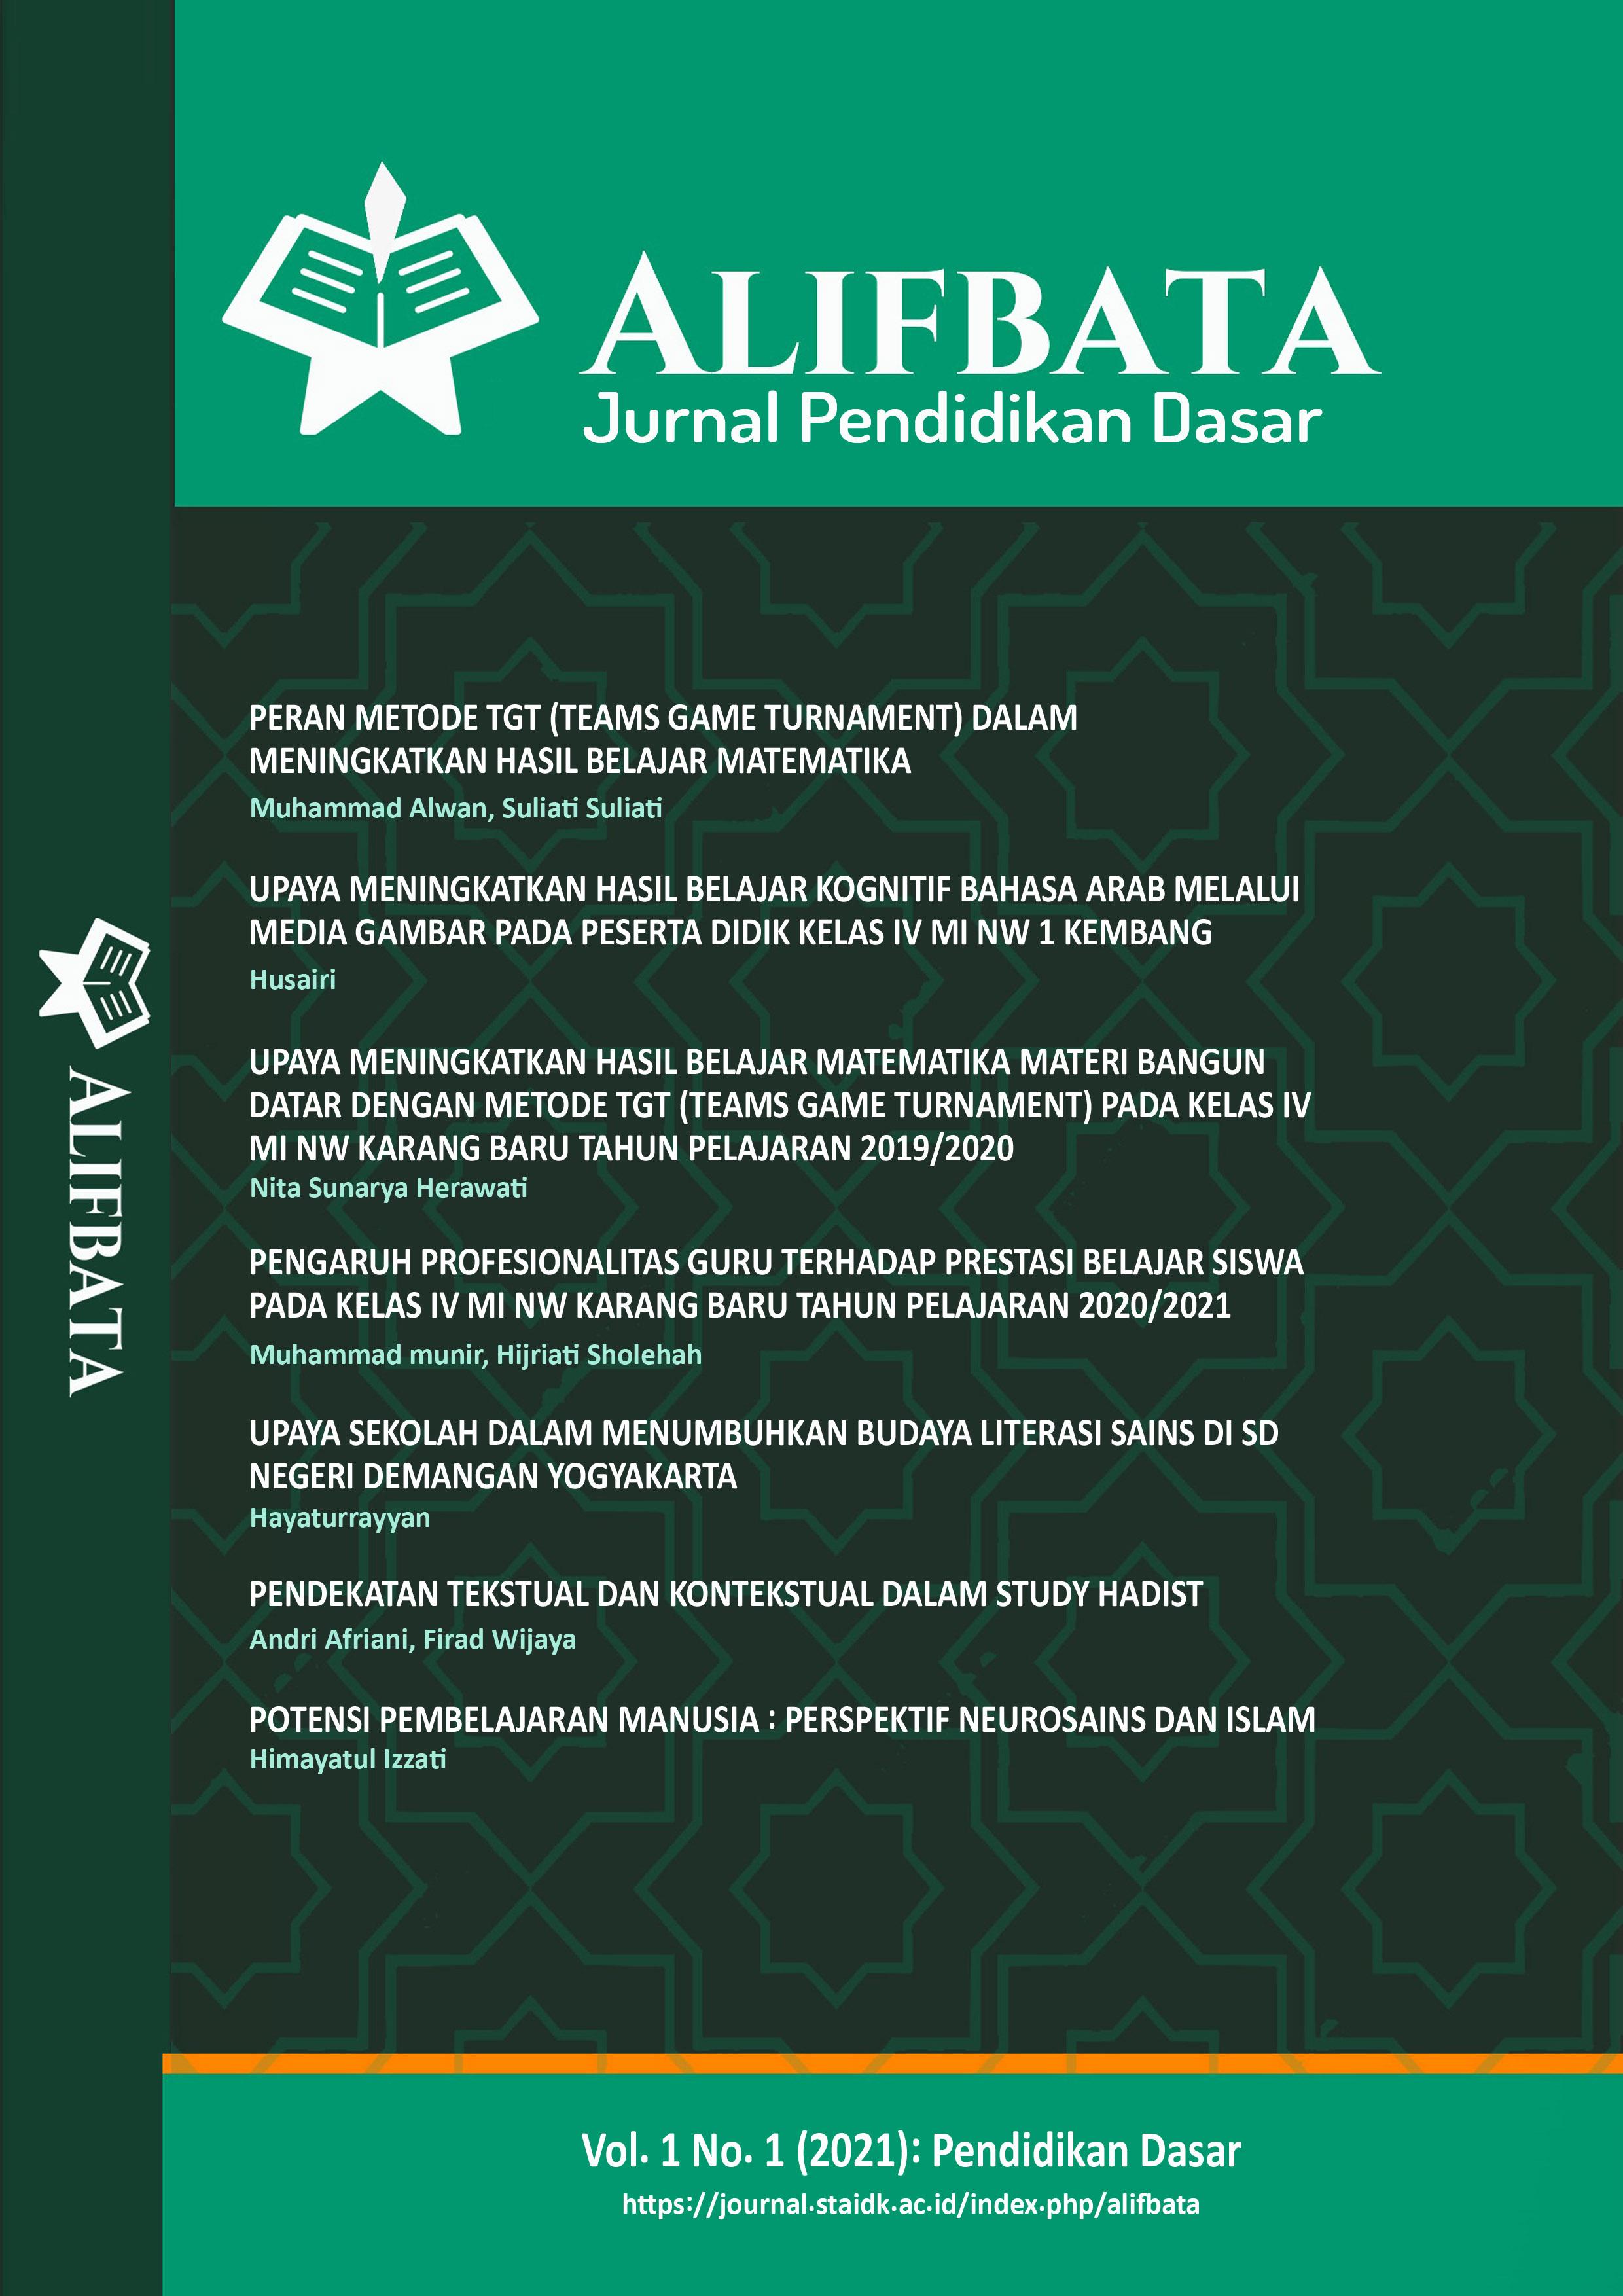 View Vol. 1 No. 1 (2021): Pendidikan Dasar